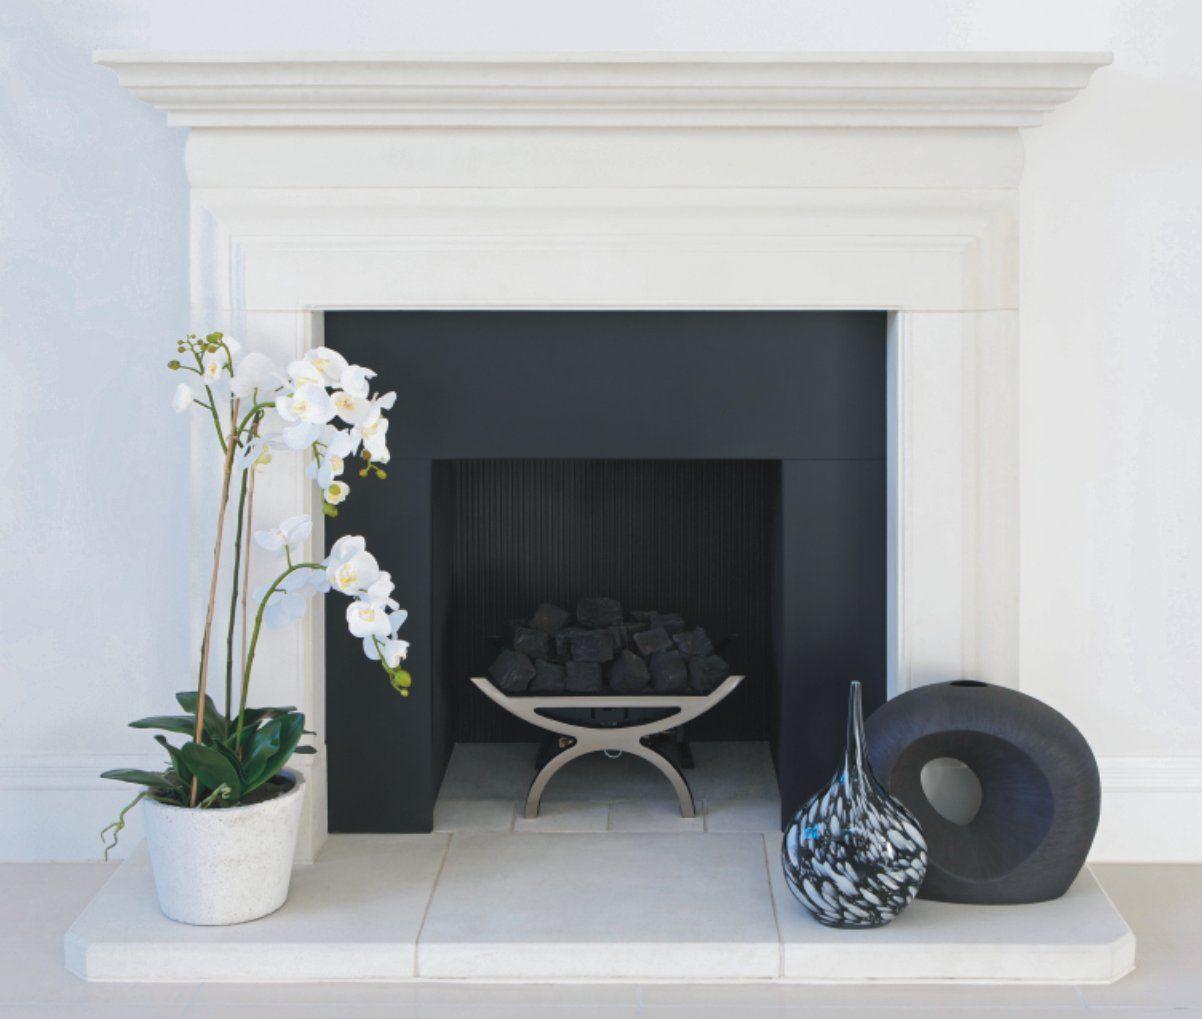 stonelux fireplace stone coating the stone effect fireplace